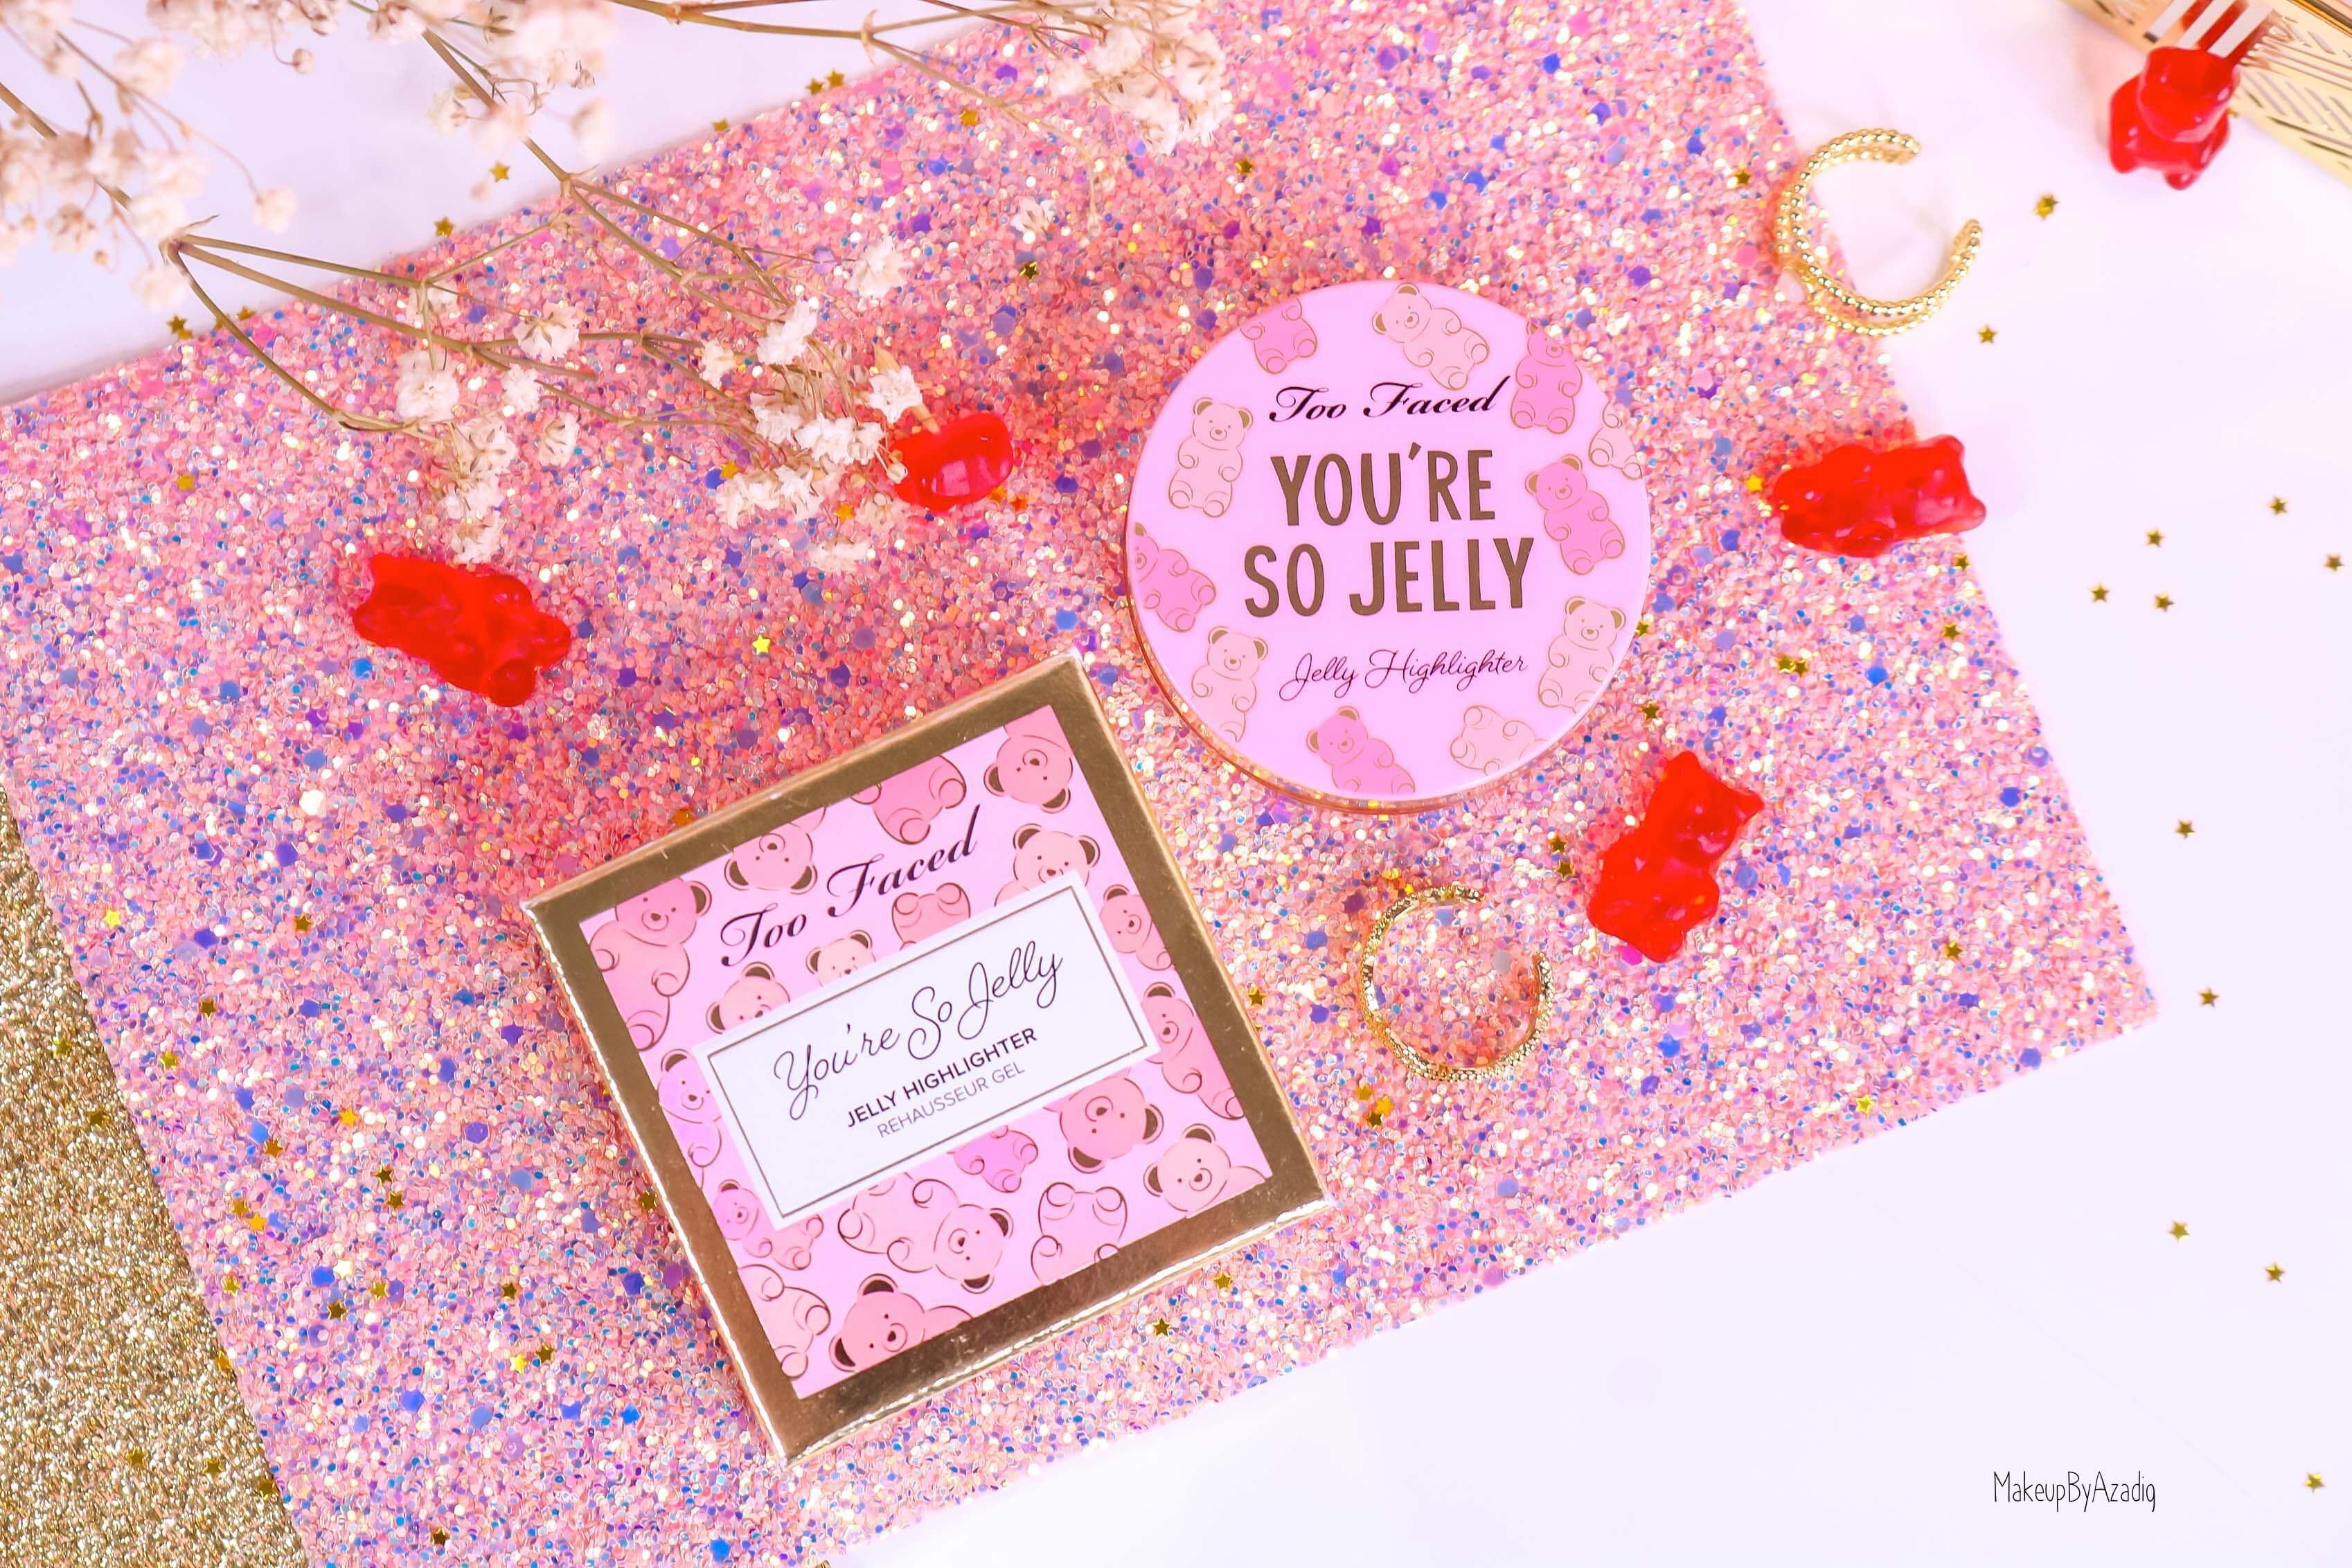 revue-highlighter-jelly-gel-rose-pink-too-faced-texture-cute-avis-prix-swatch-makeupbyazadig-sephora-france-girly